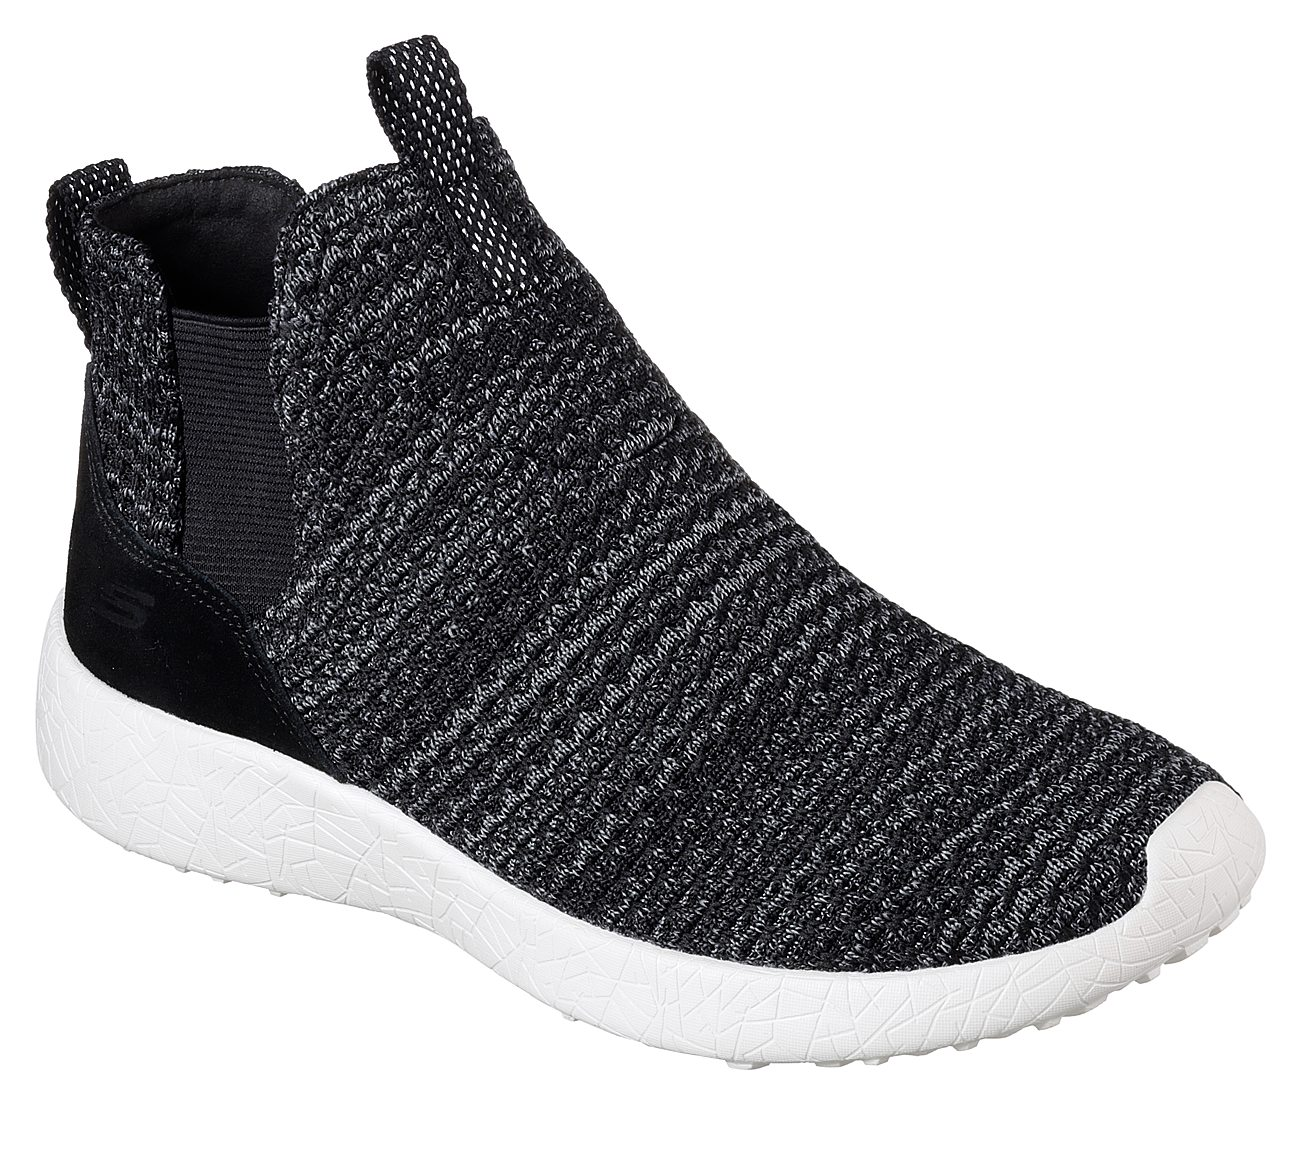 e0f0bc790c6d Buy SKECHERS Burst - Fresh Thinking Sport Shoes only  75.00